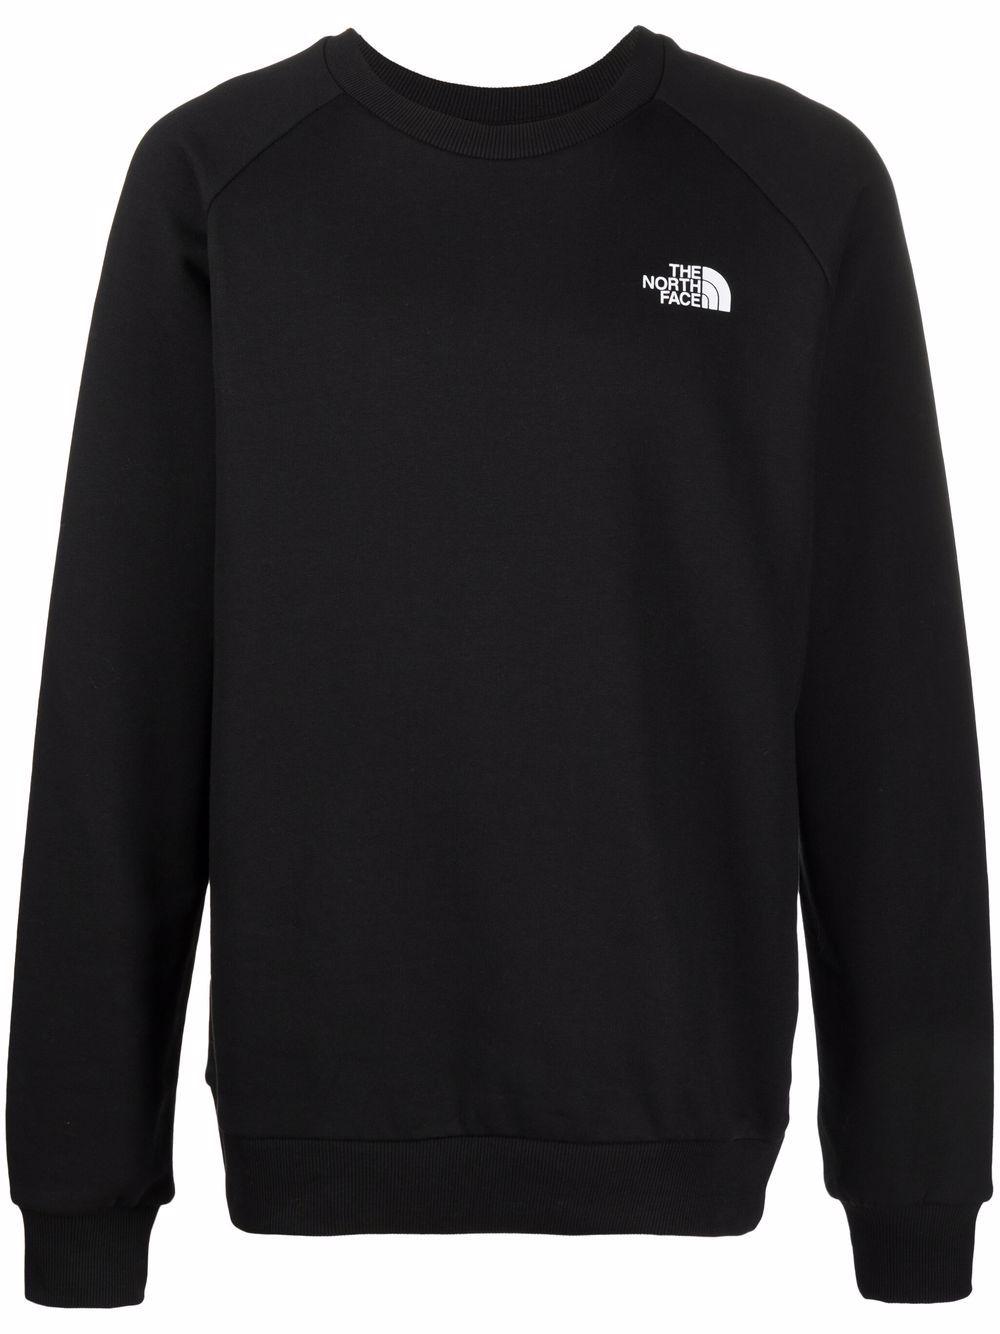 raglan redbox sweatshirt man black in cotton THE NORTH FACE   Sweatshirts   NF0A4SZ9JK31